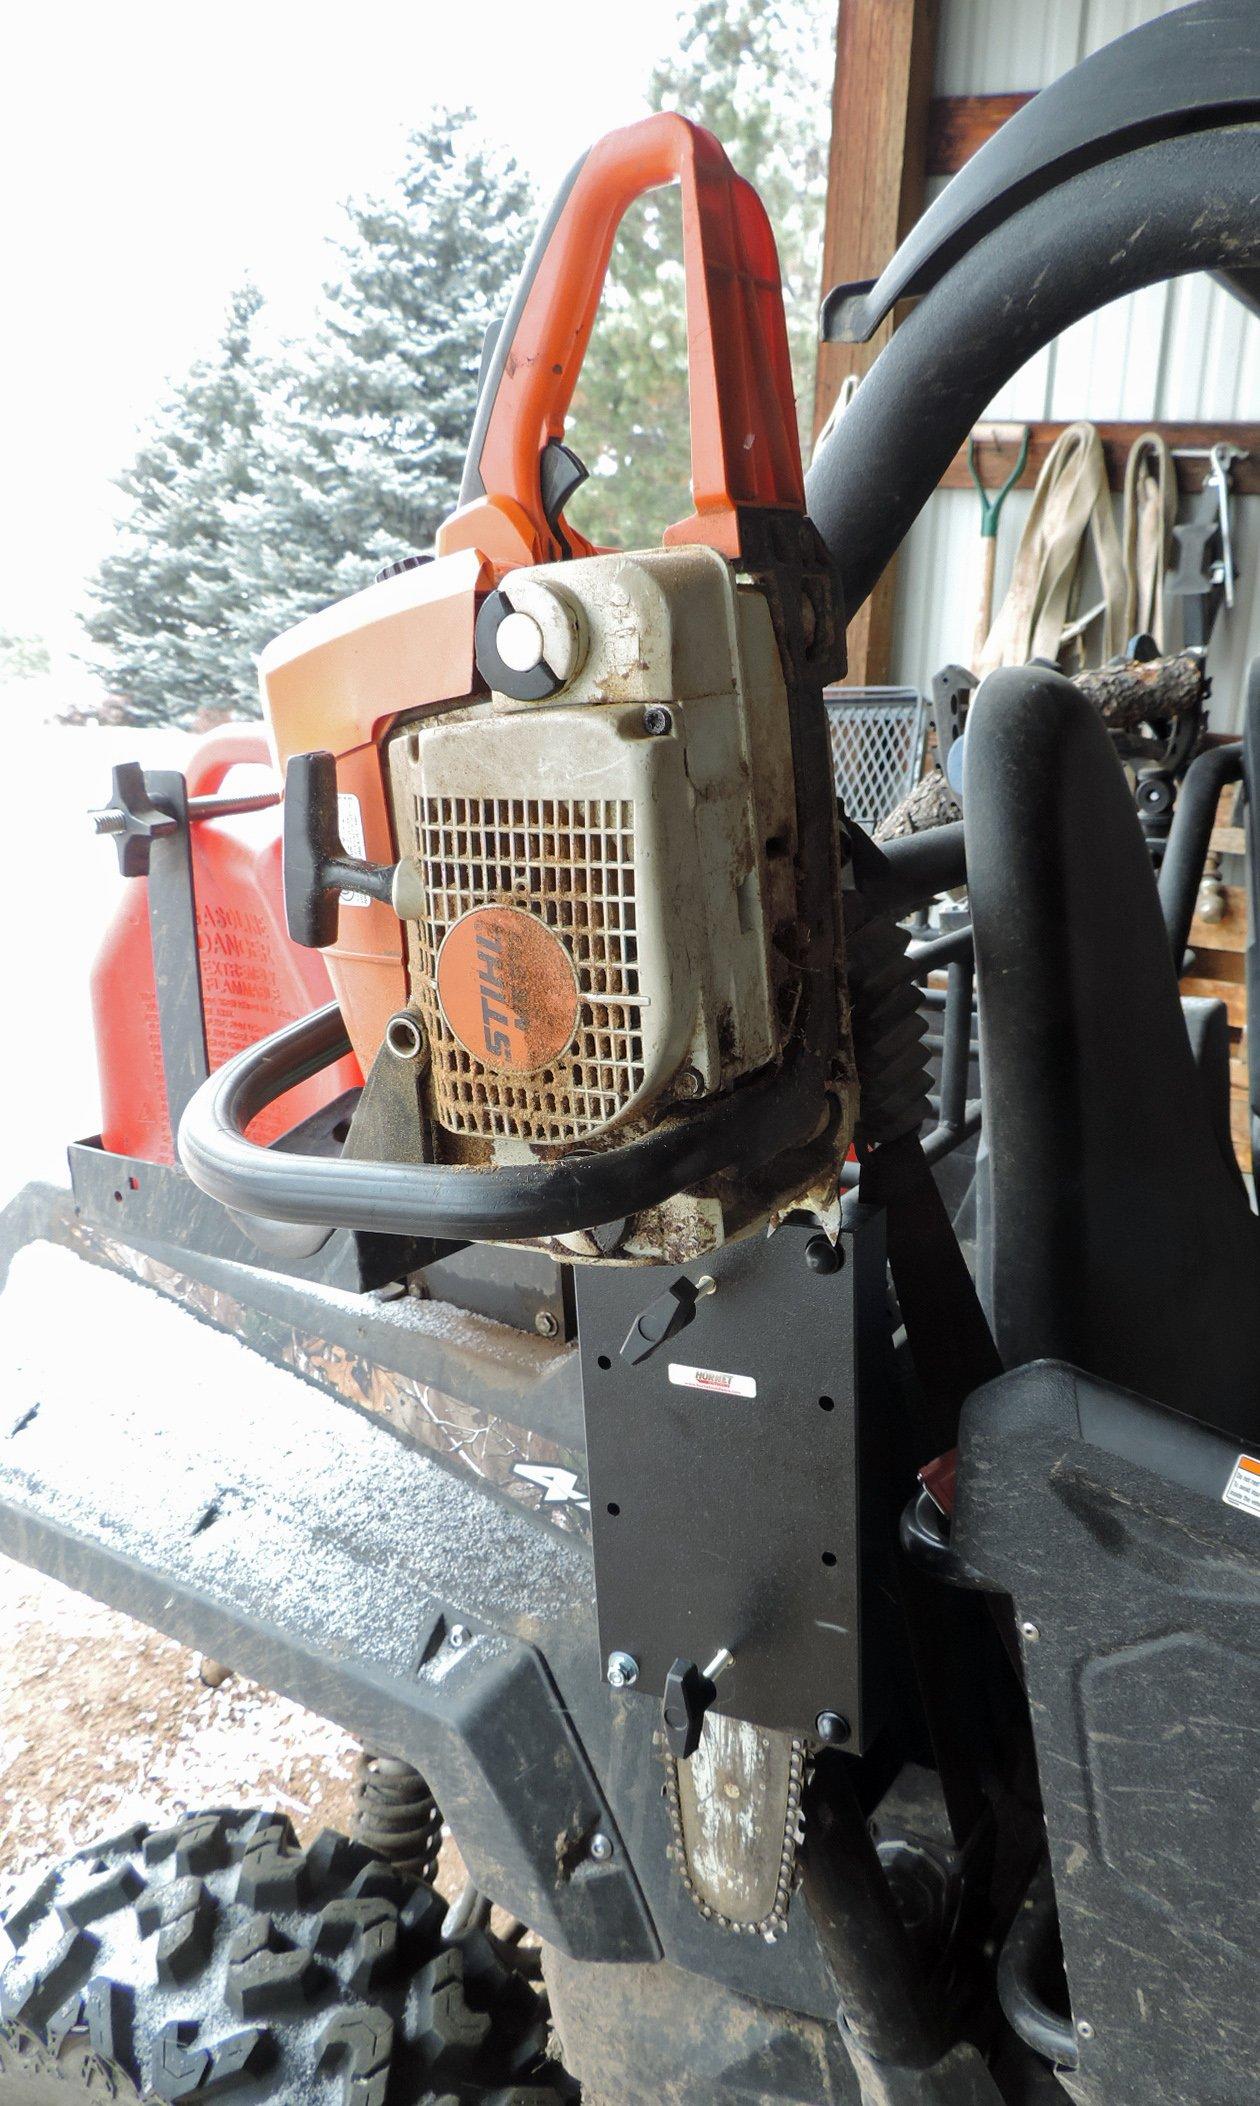 John Deere Gator Roll Bar Chainsaw Mount RCM-3012 by Hornet Outdoors (Image #3)